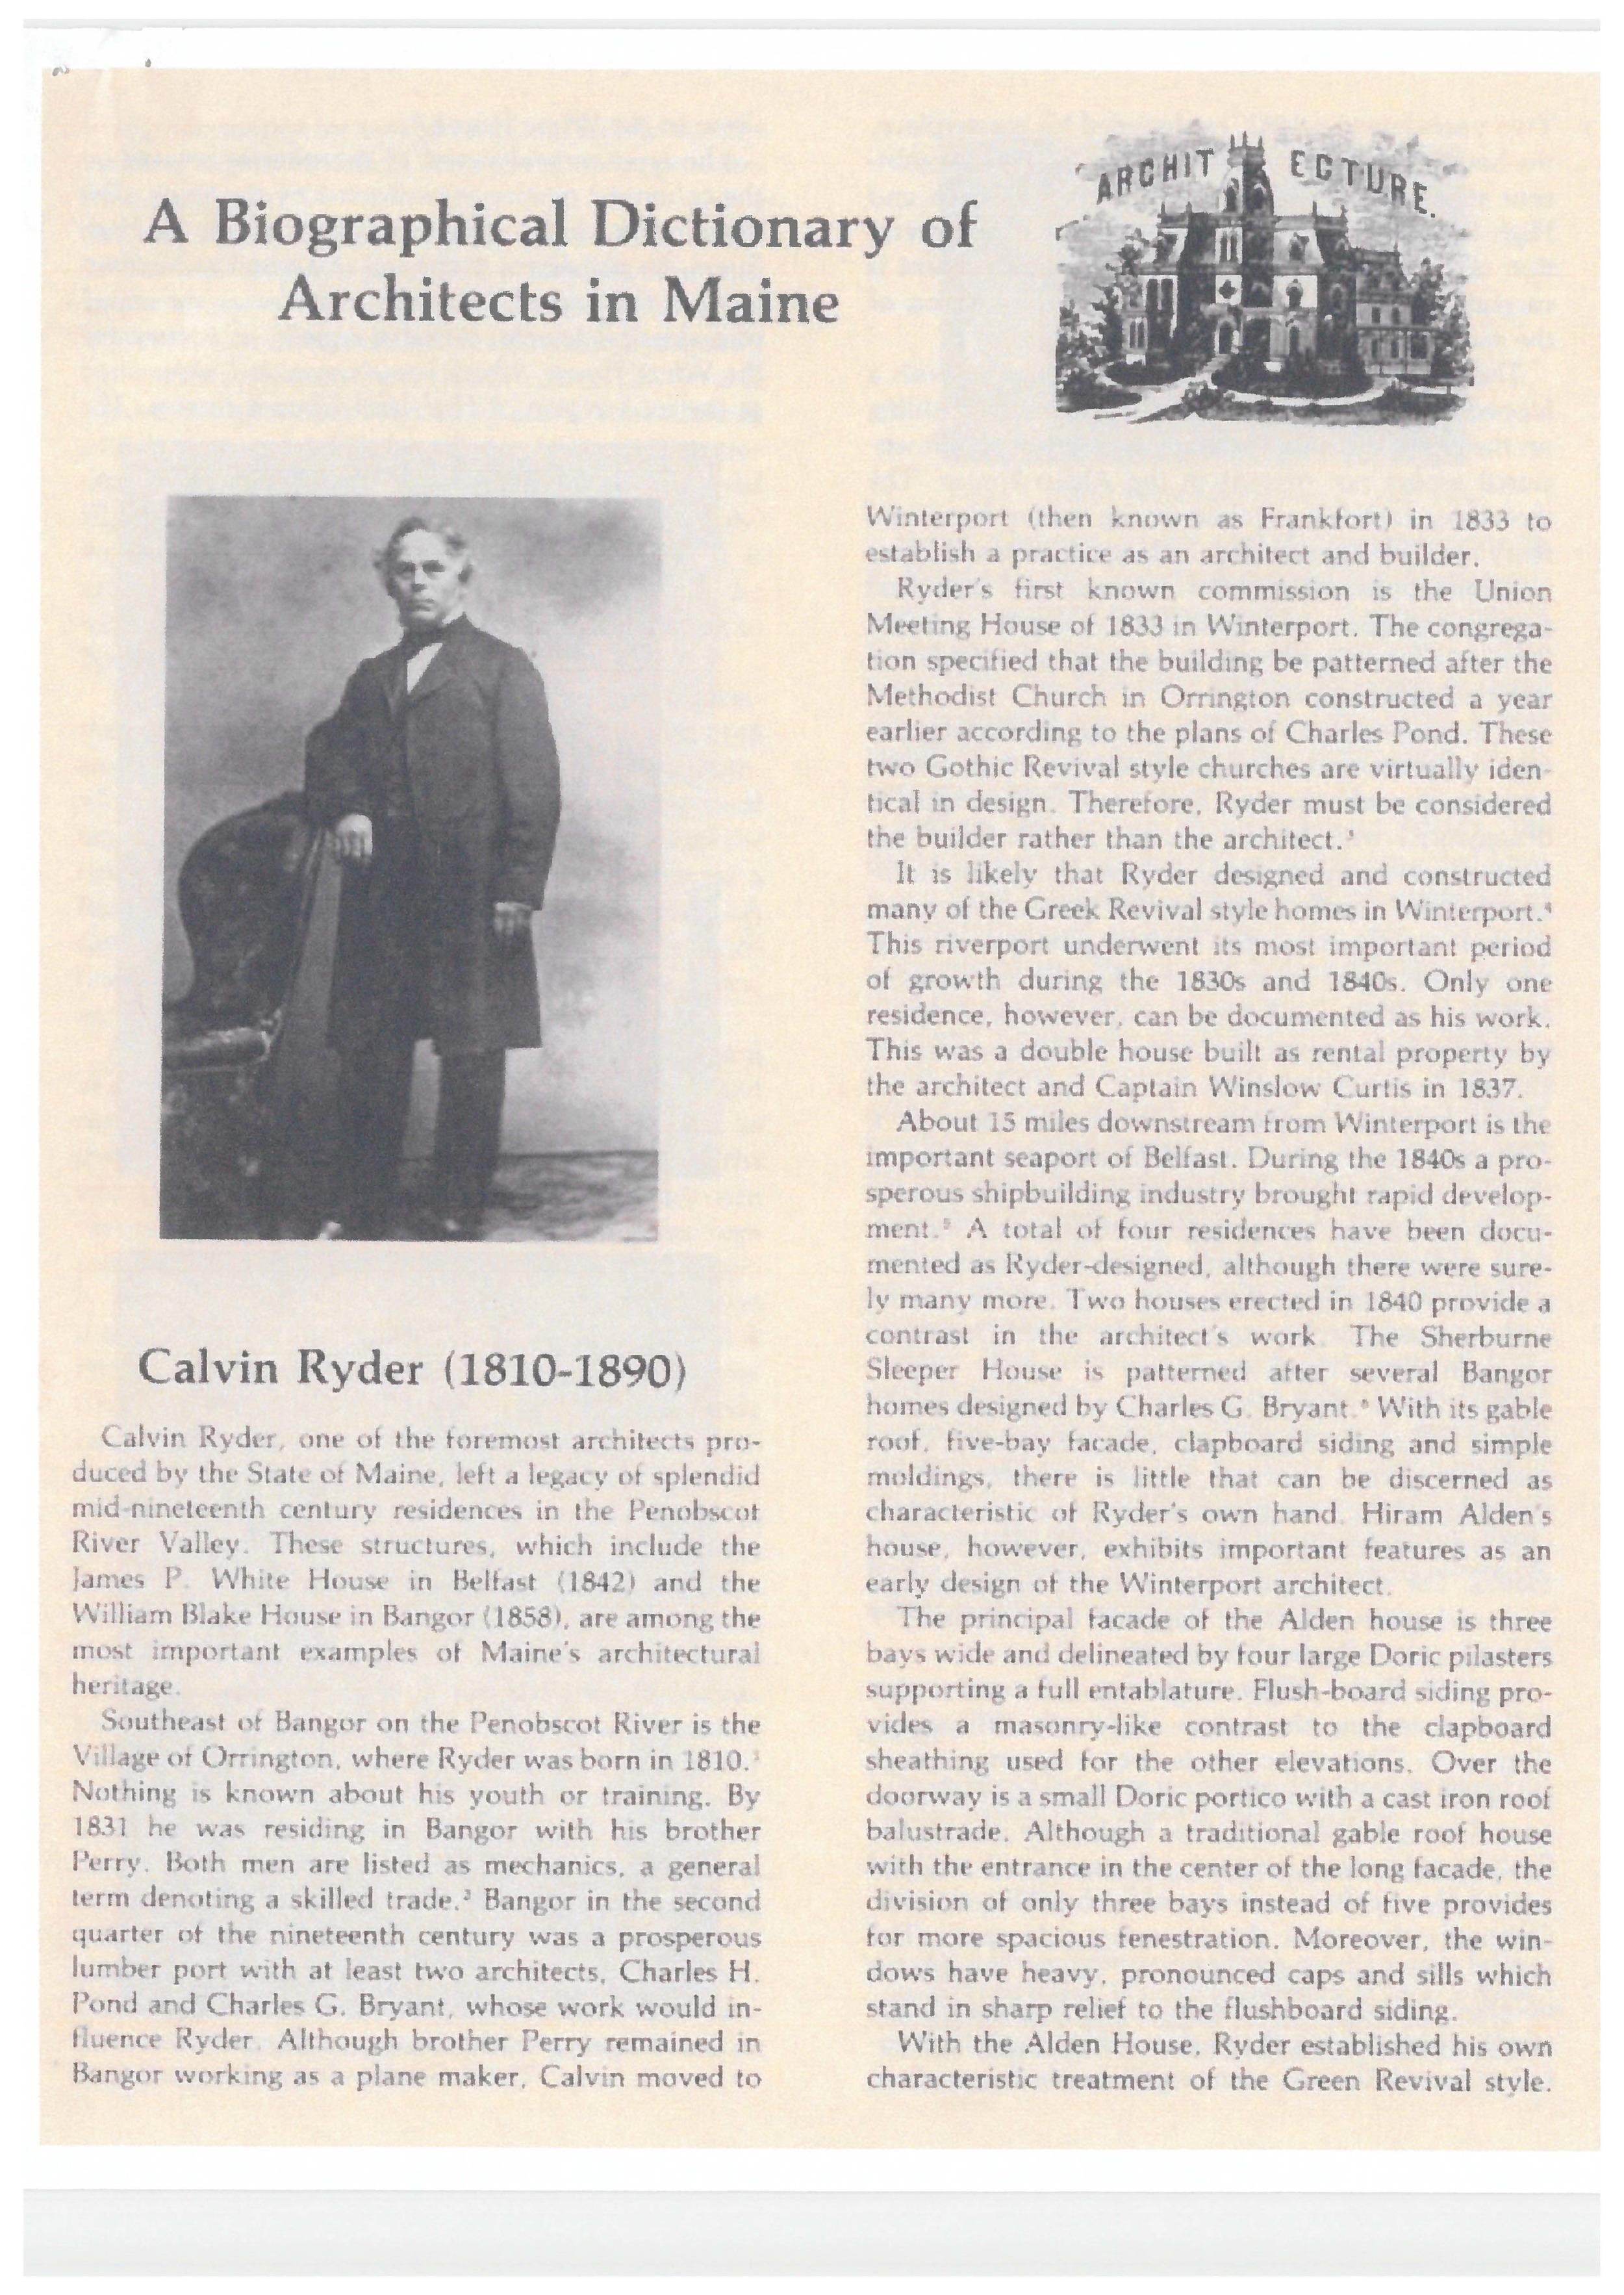 Biography of Calvin Ryder, the original architect of 6 Union Park.